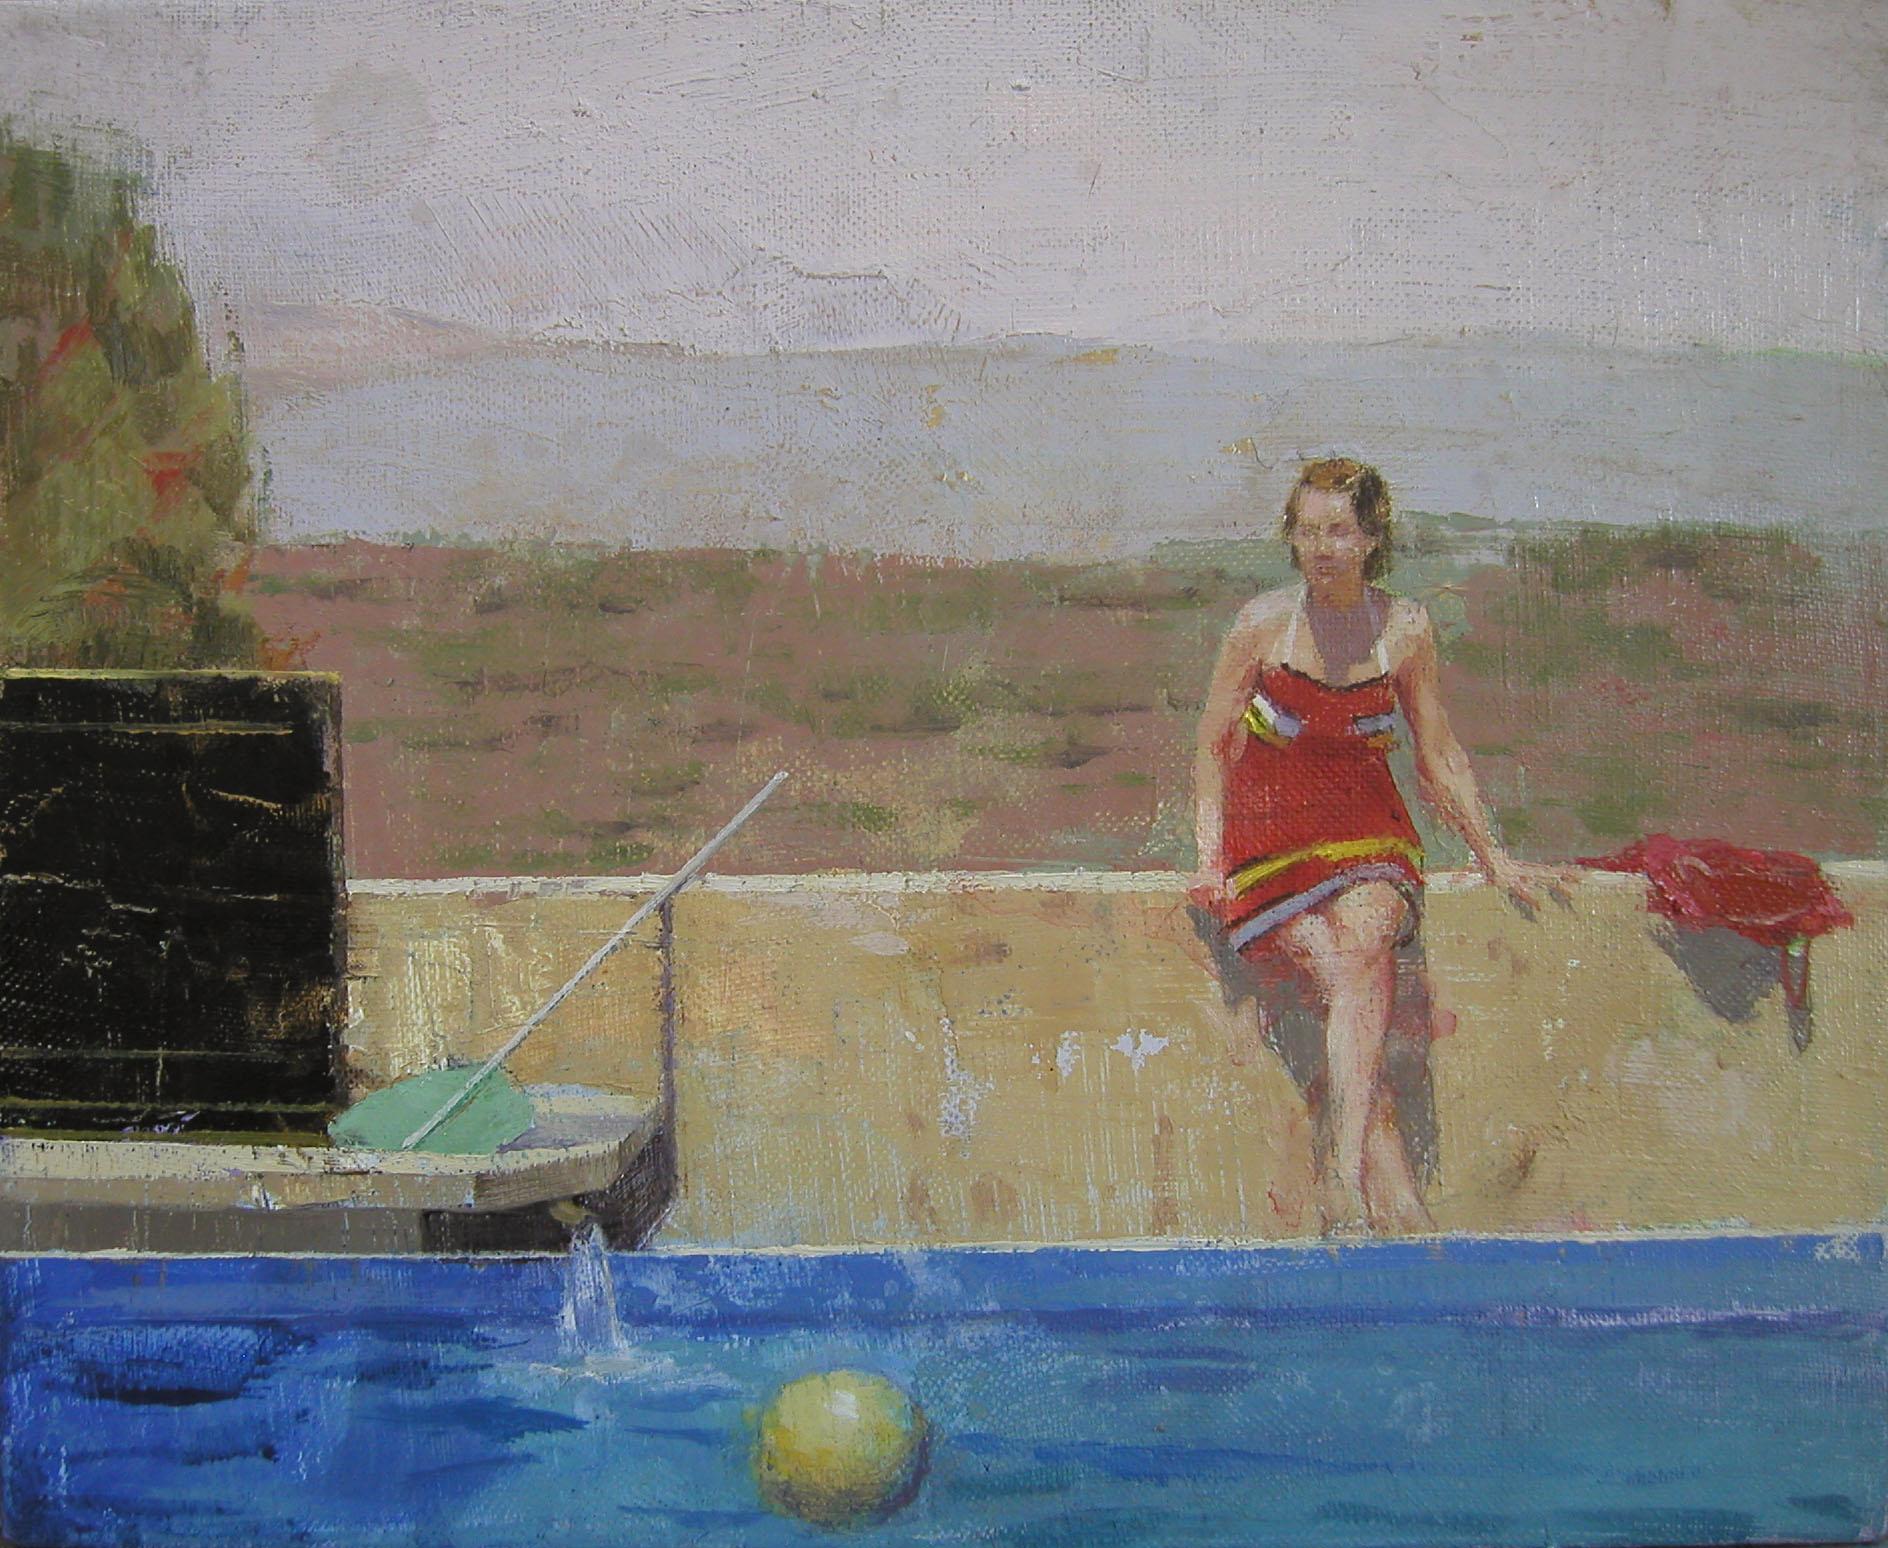 mamá-mujer-piscina-alejandra-caballero